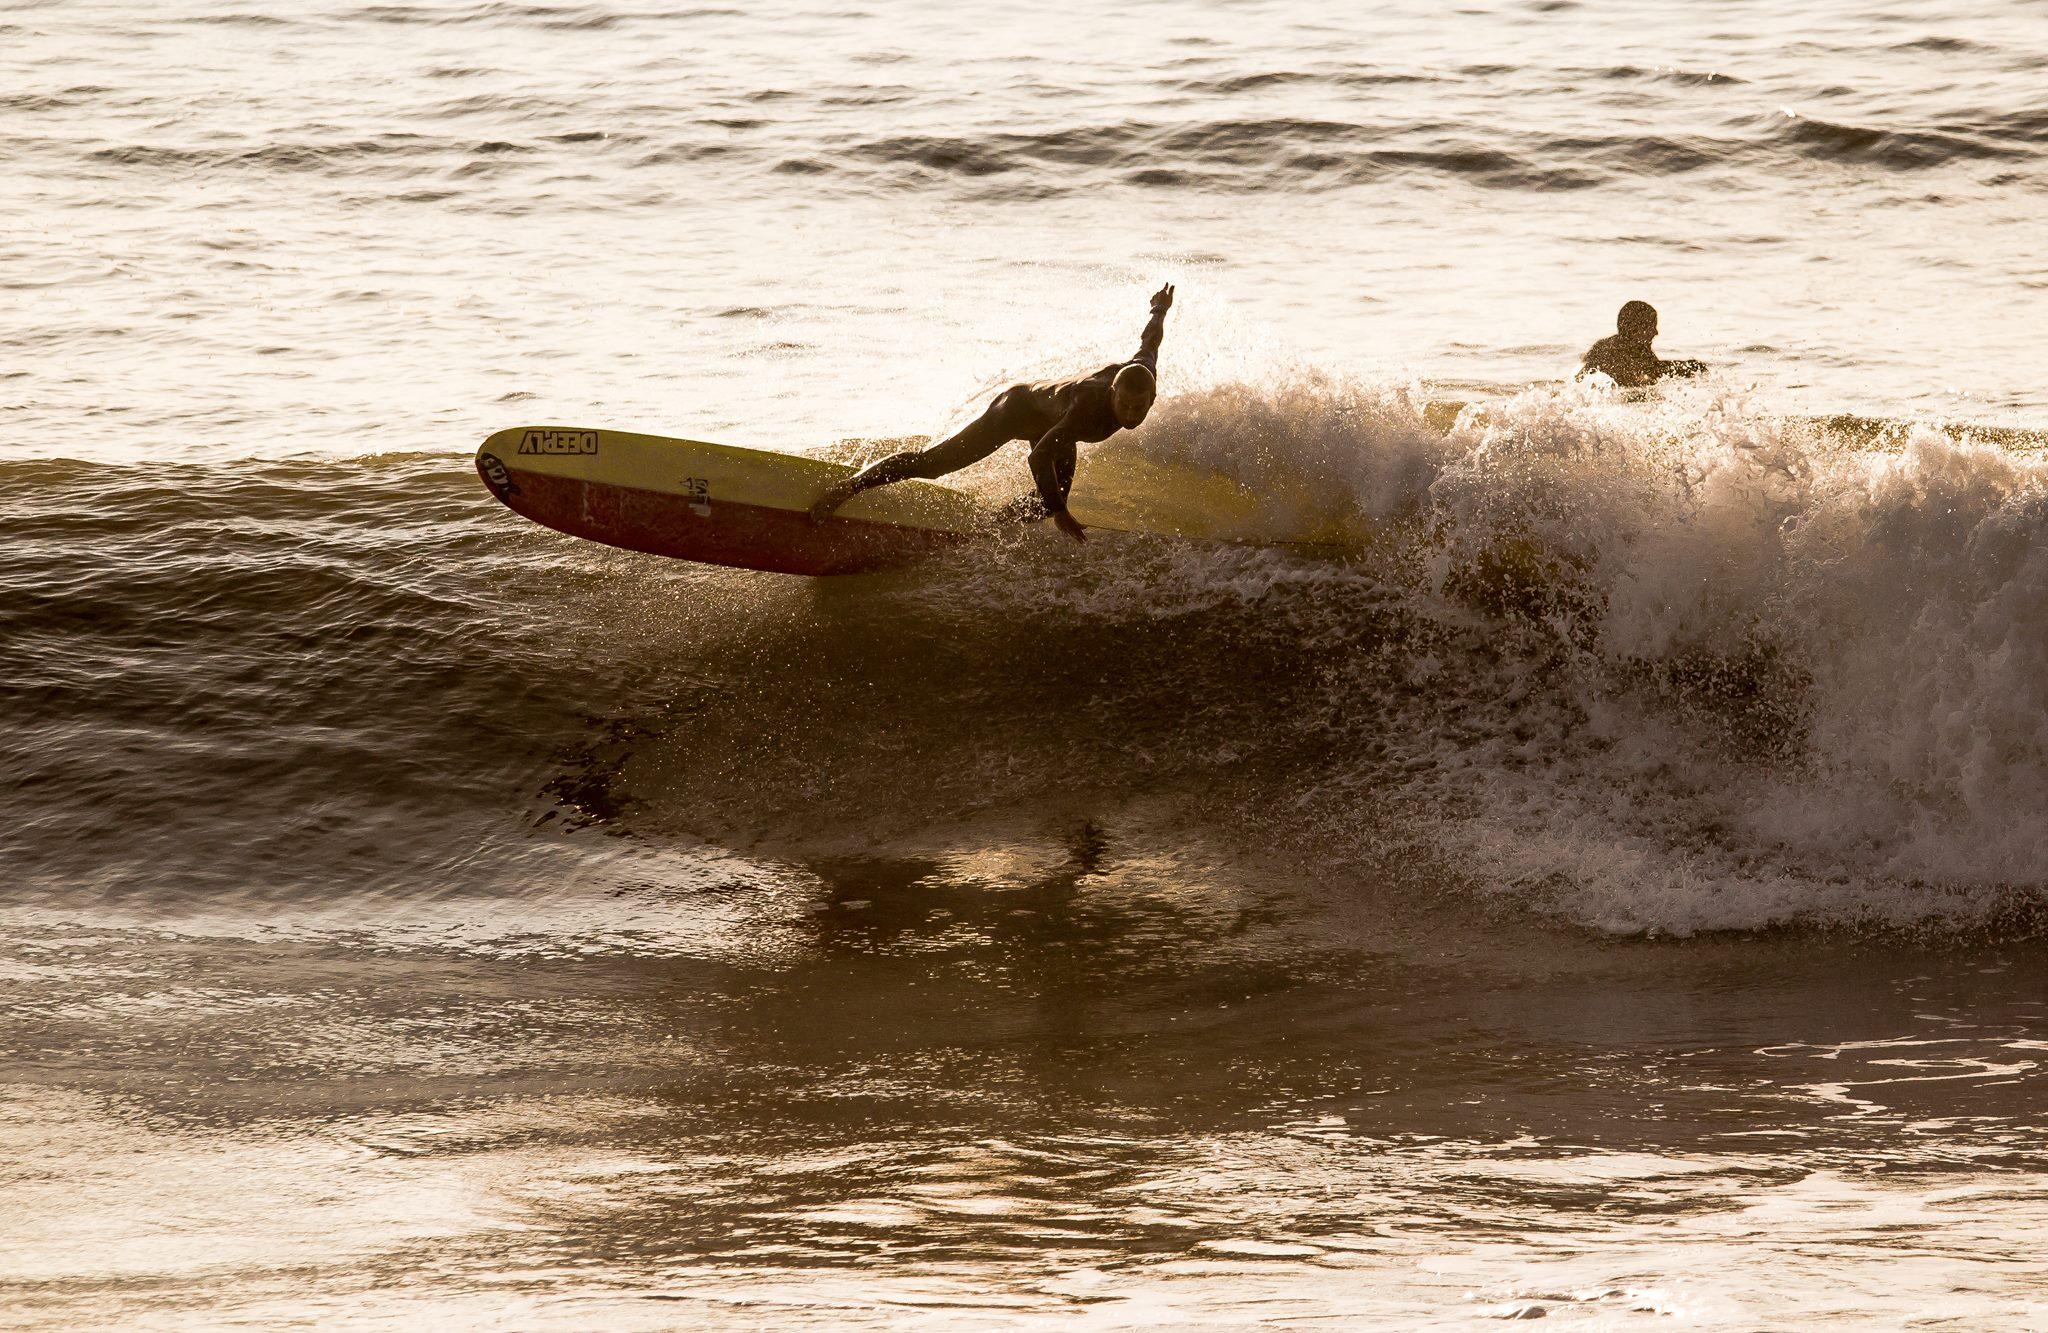 SURF CAMP - In Esmoriz